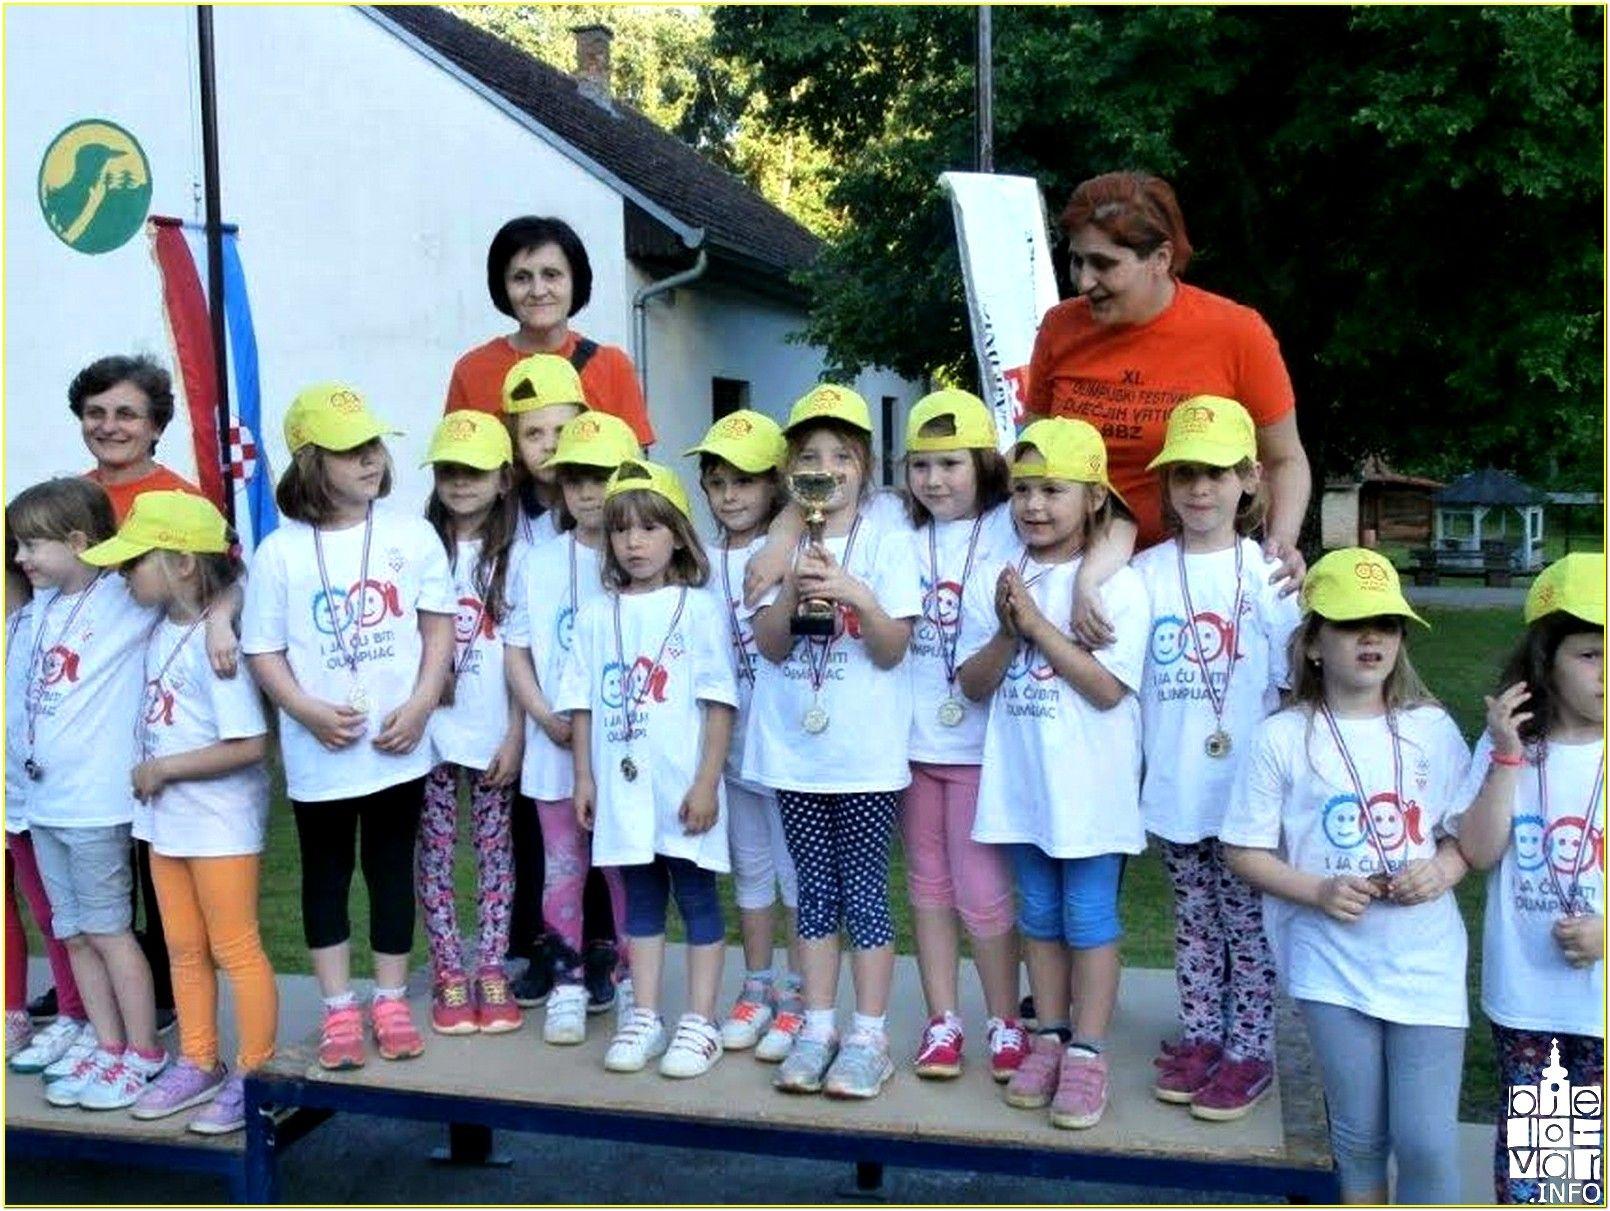 Održan XI. Olimpijski festival Dječjih vrtića BBŽ-a